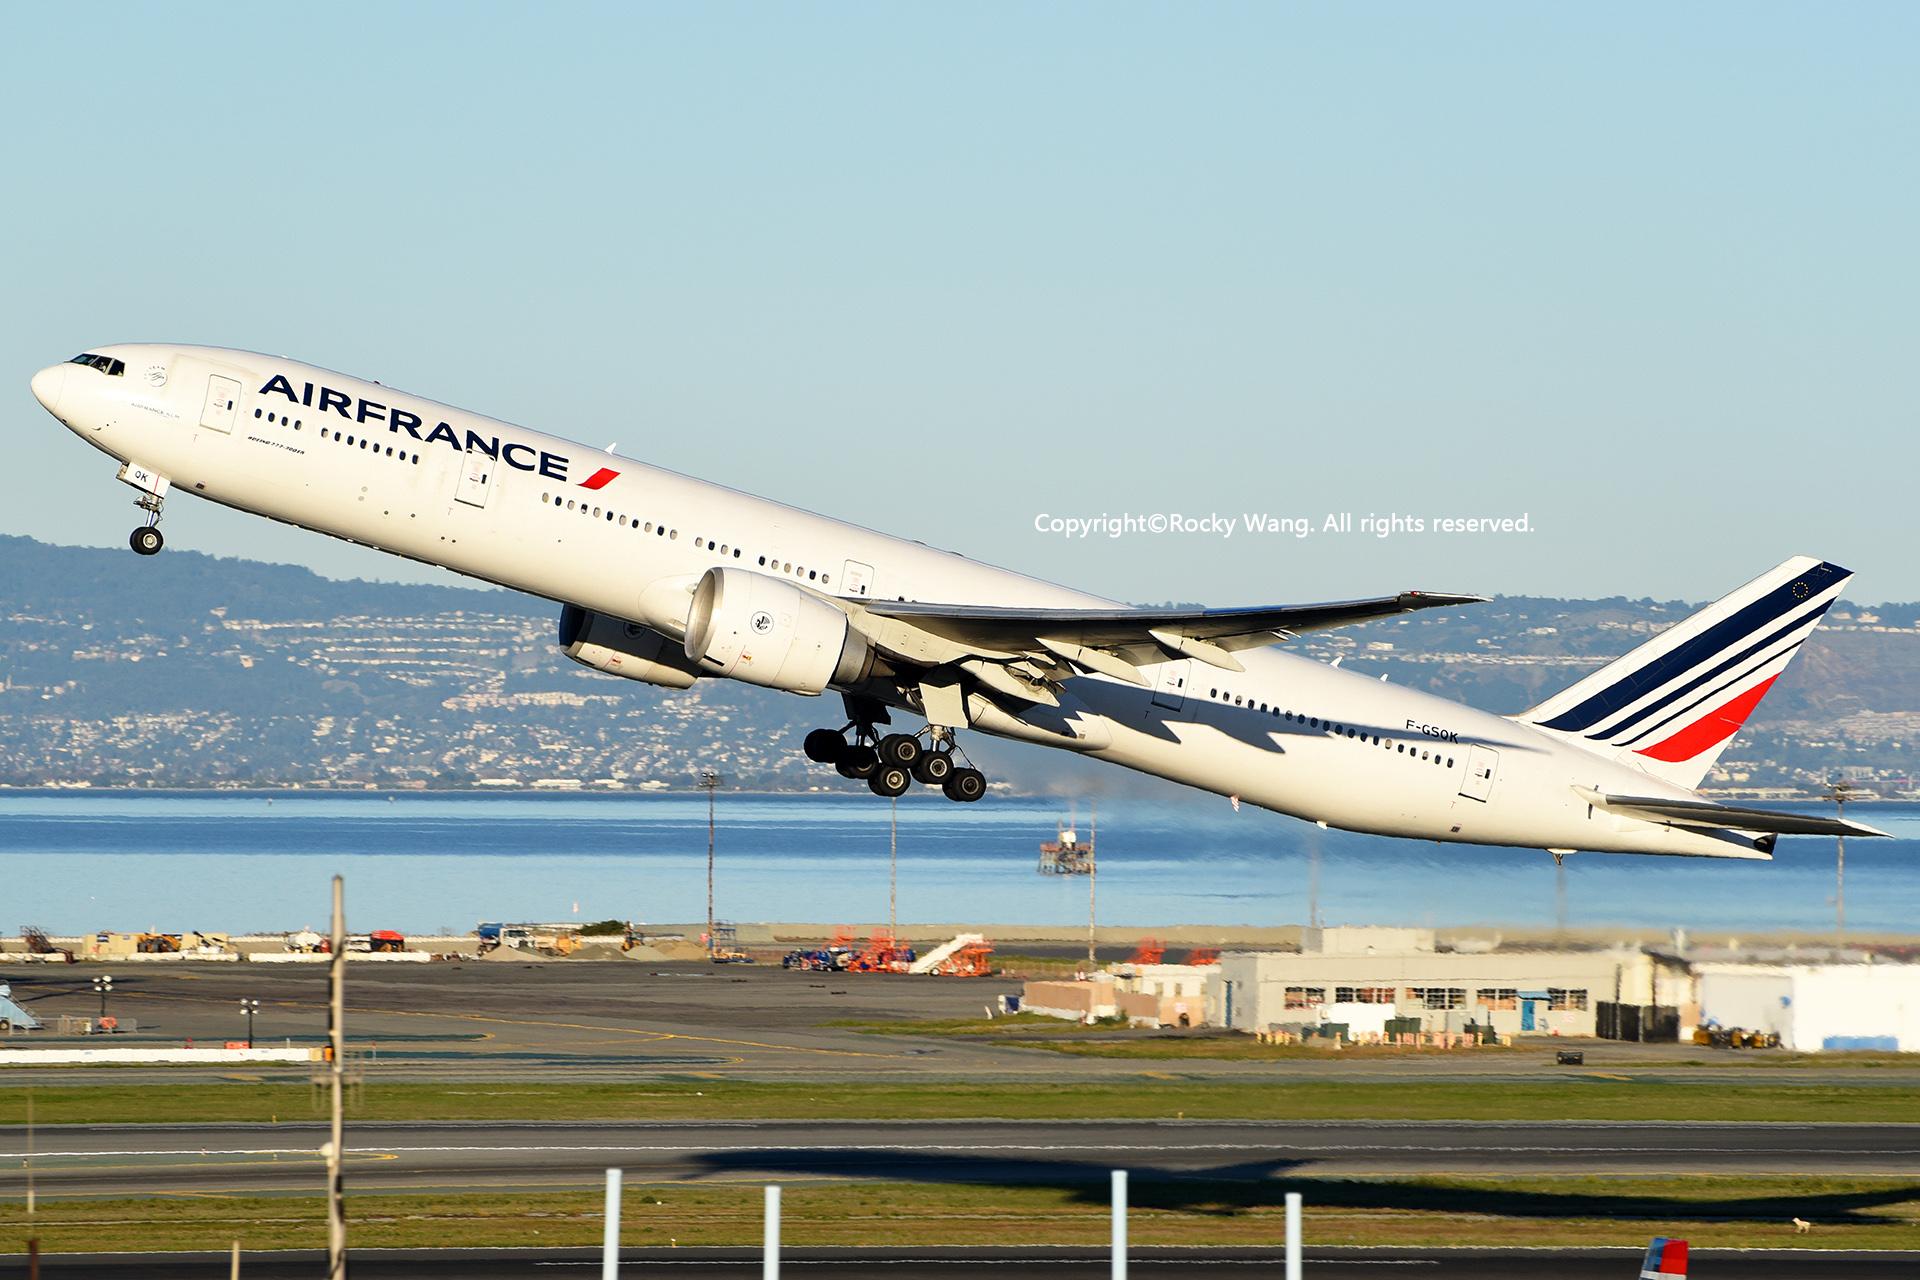 Re:[原创]居家了 批量处理老图 倾情奉献52家777 BOEING 777-328ER F-GSQK San Francisco Int'l Airport